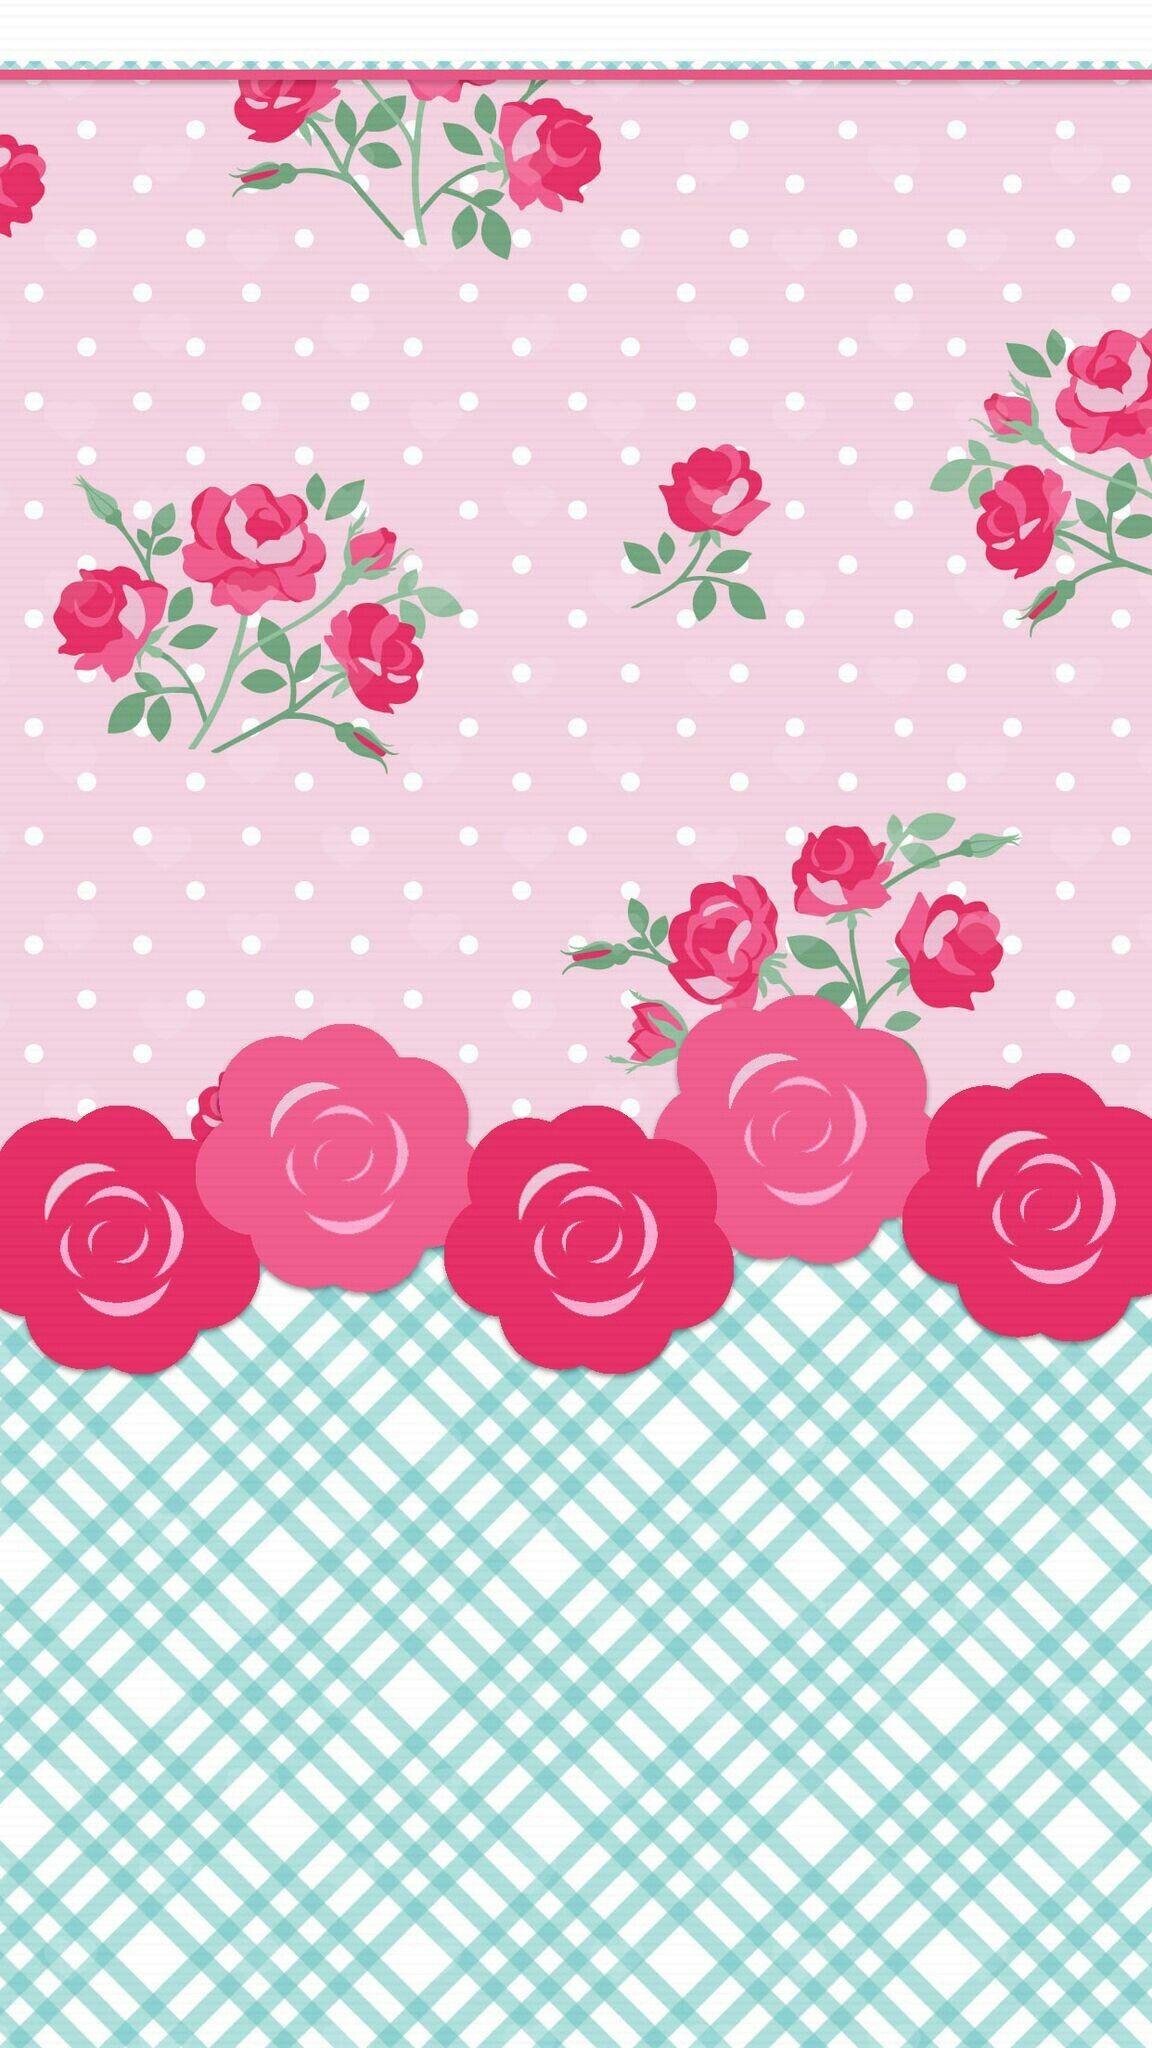 Cool Wallpaper Hello Kitty Floral - 1b6671c310fa3bf4f20a3f89cfad1d78  Trends_809689.jpg